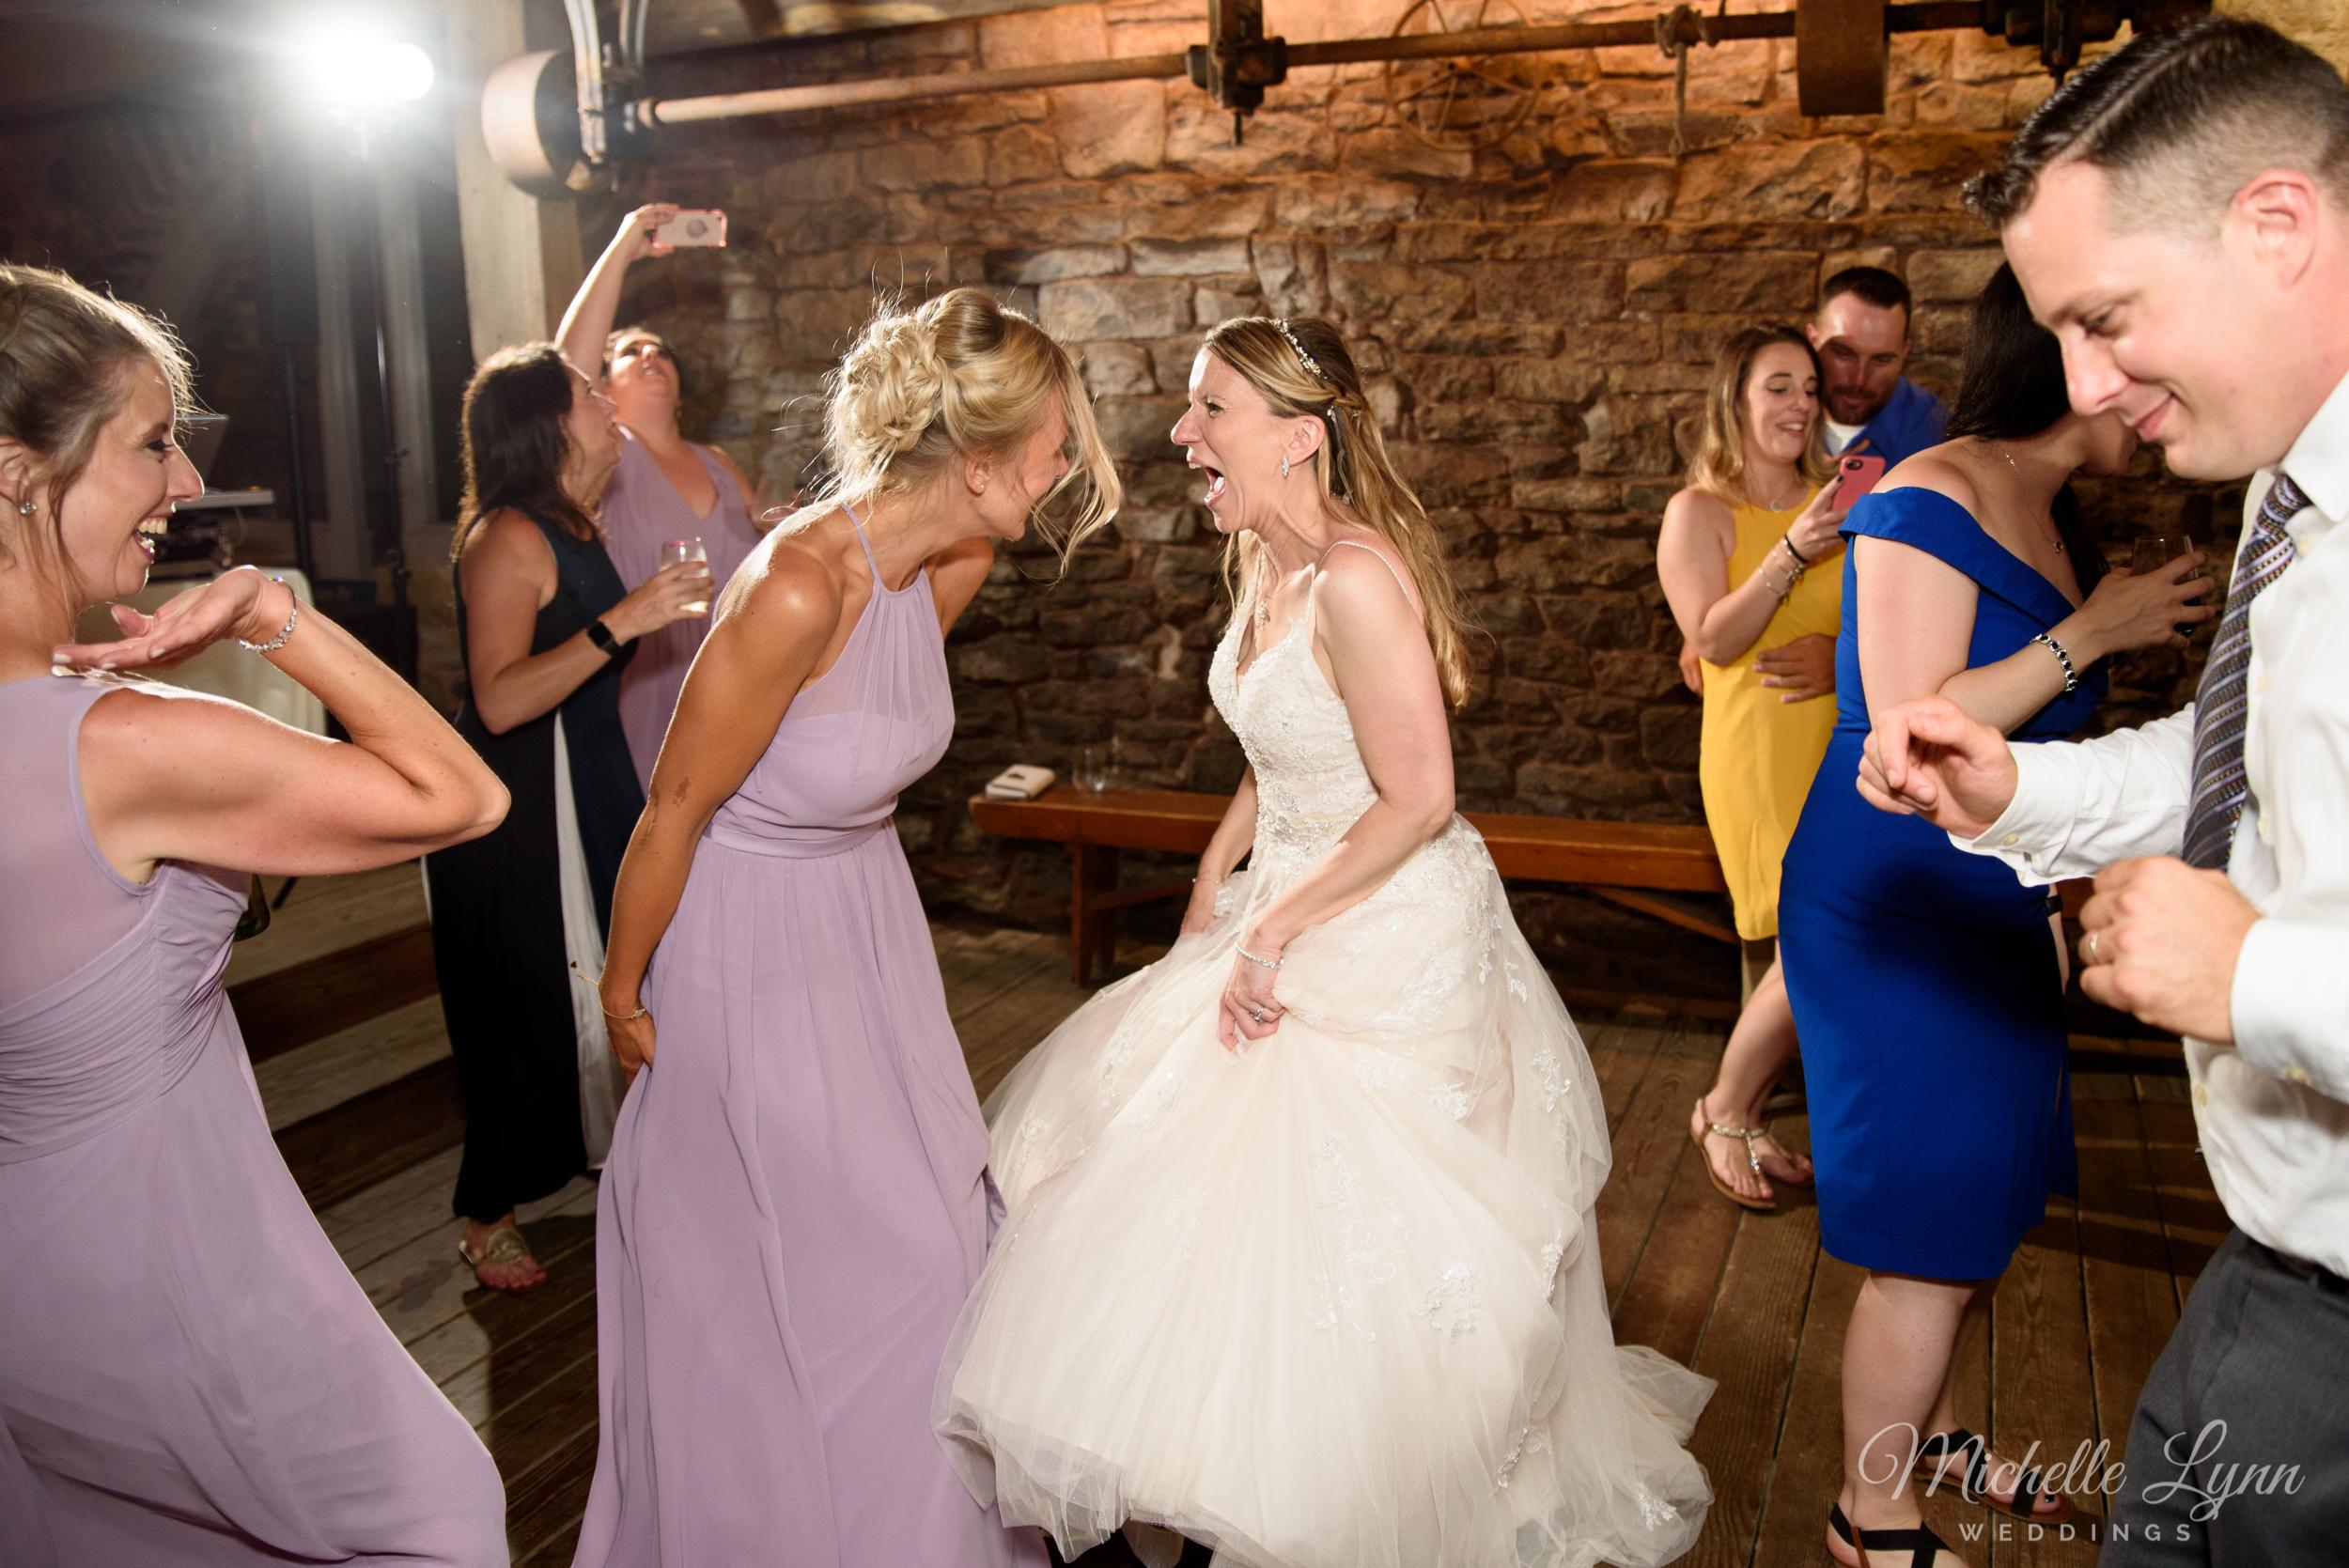 mlw-prallsville-mills-nj-wedding-photographer-93.jpg